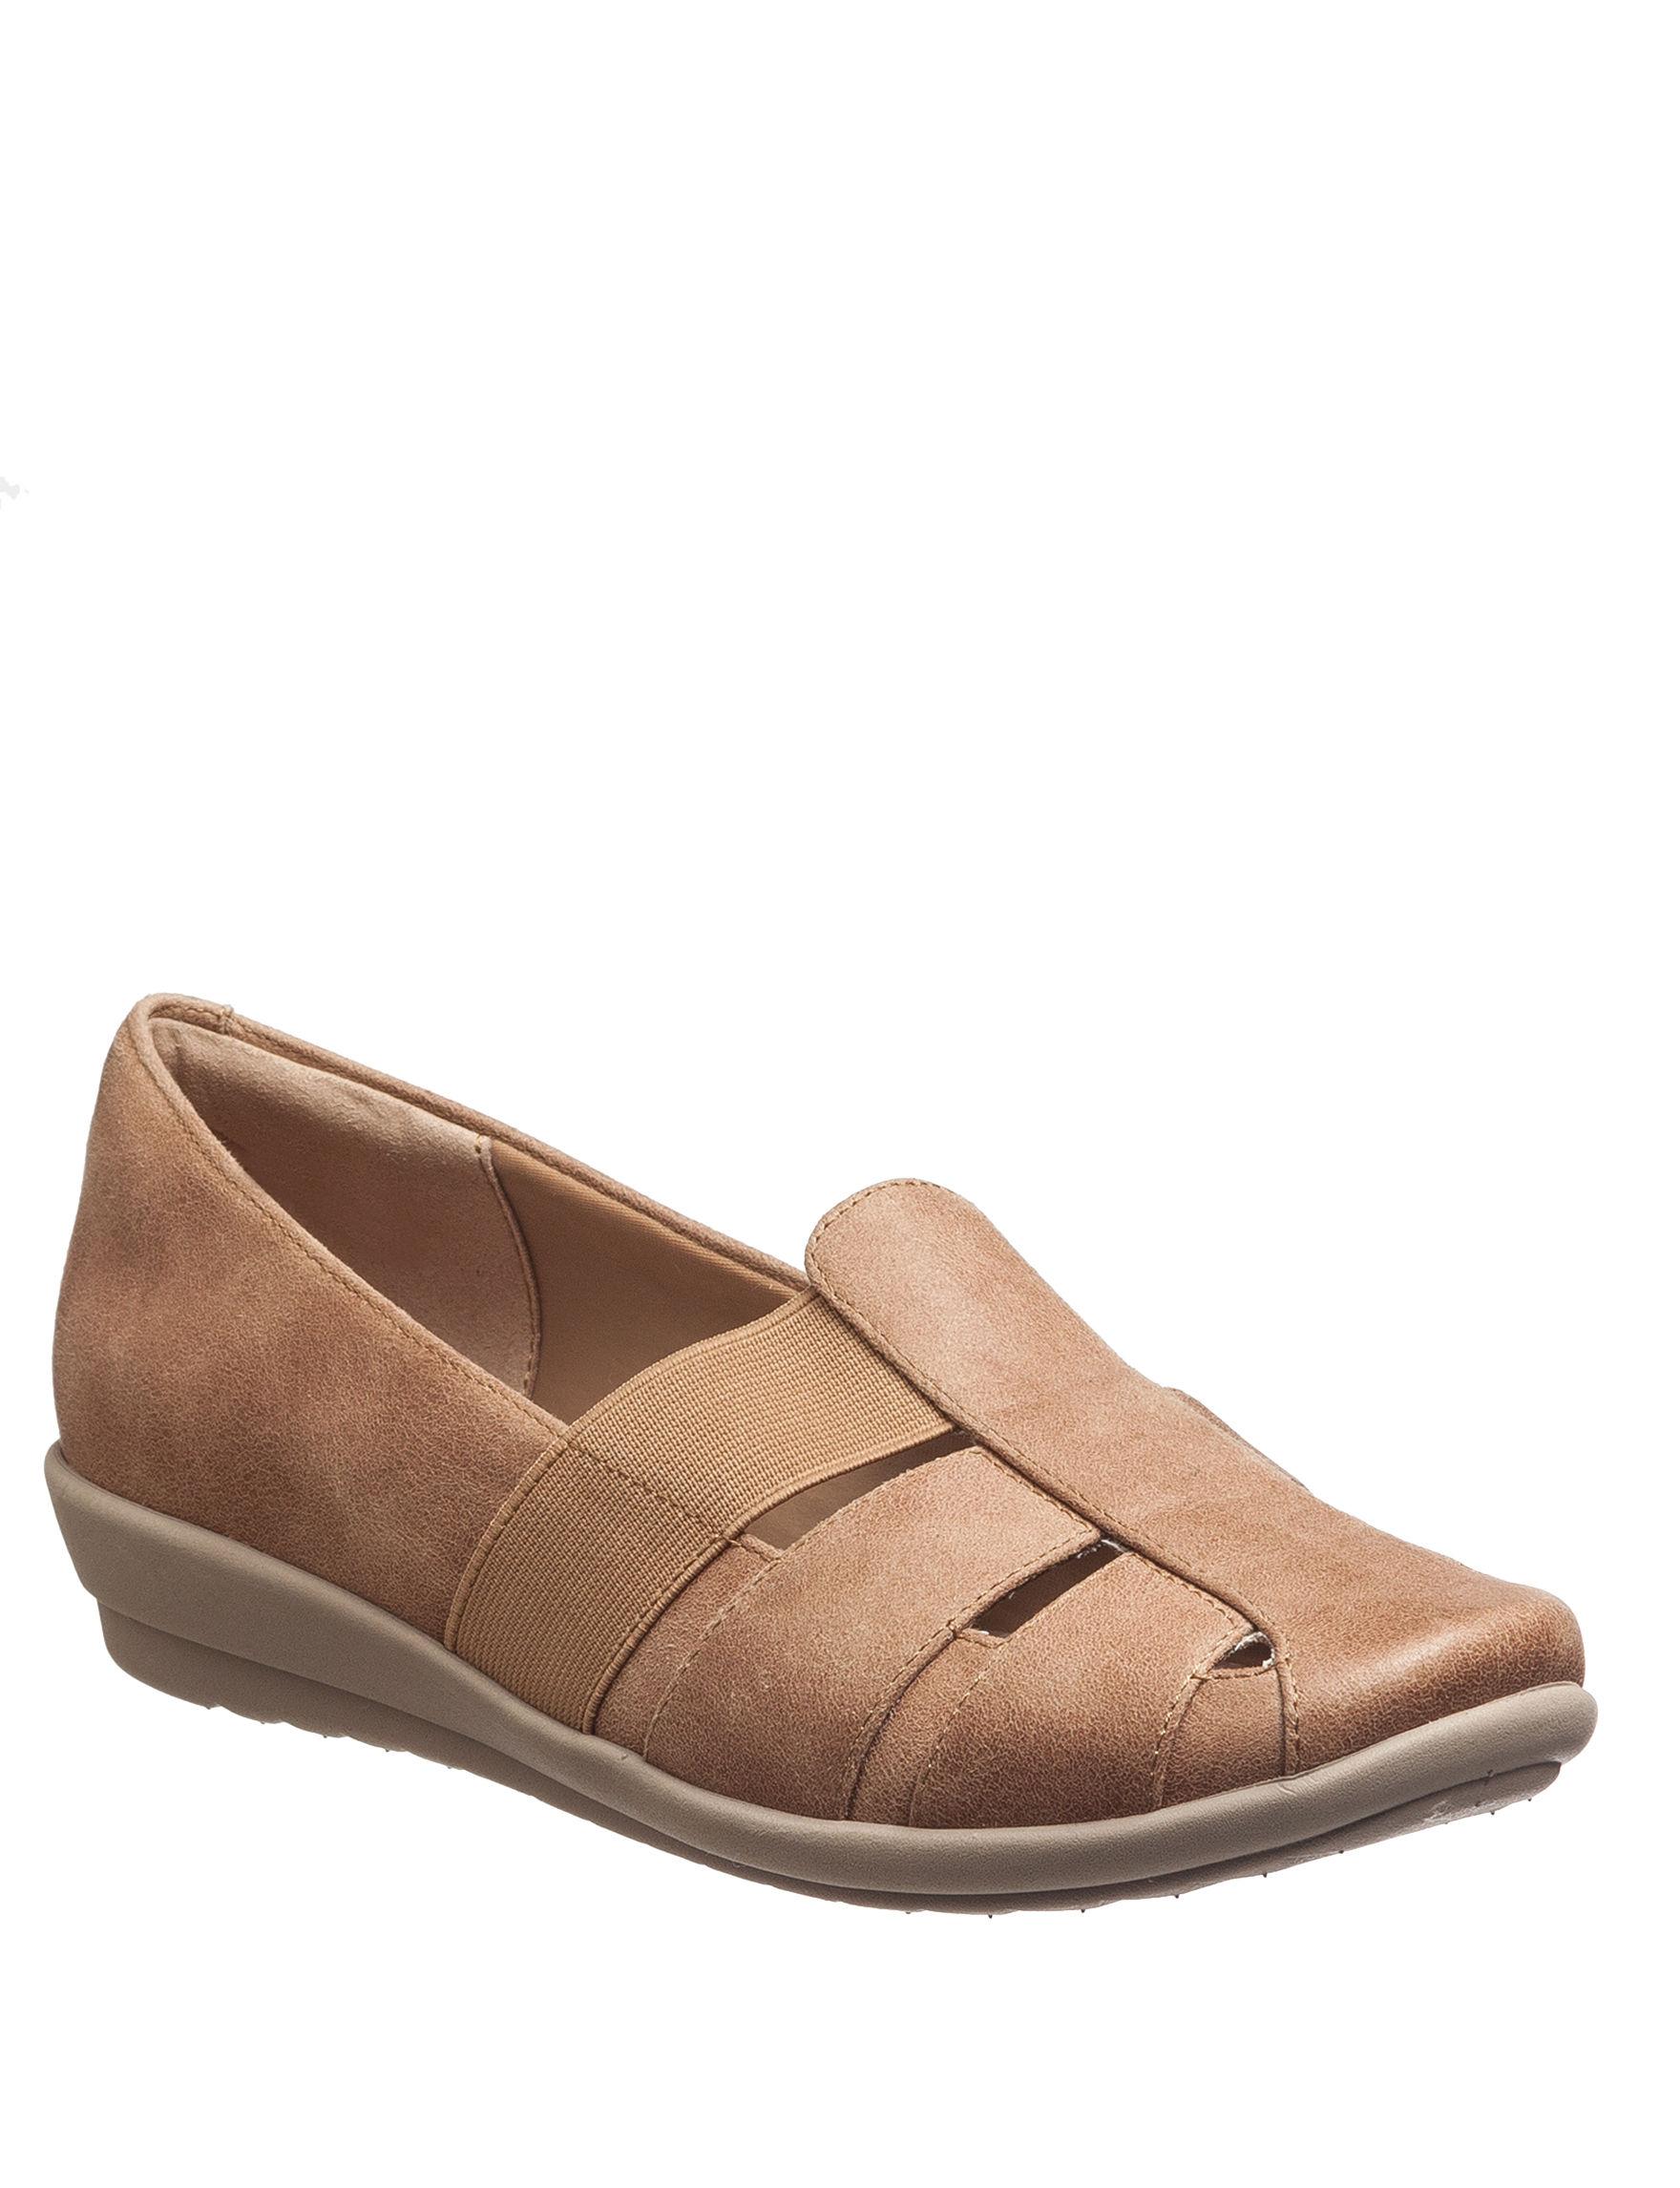 Easy Spirit Taupe Slipper Shoes